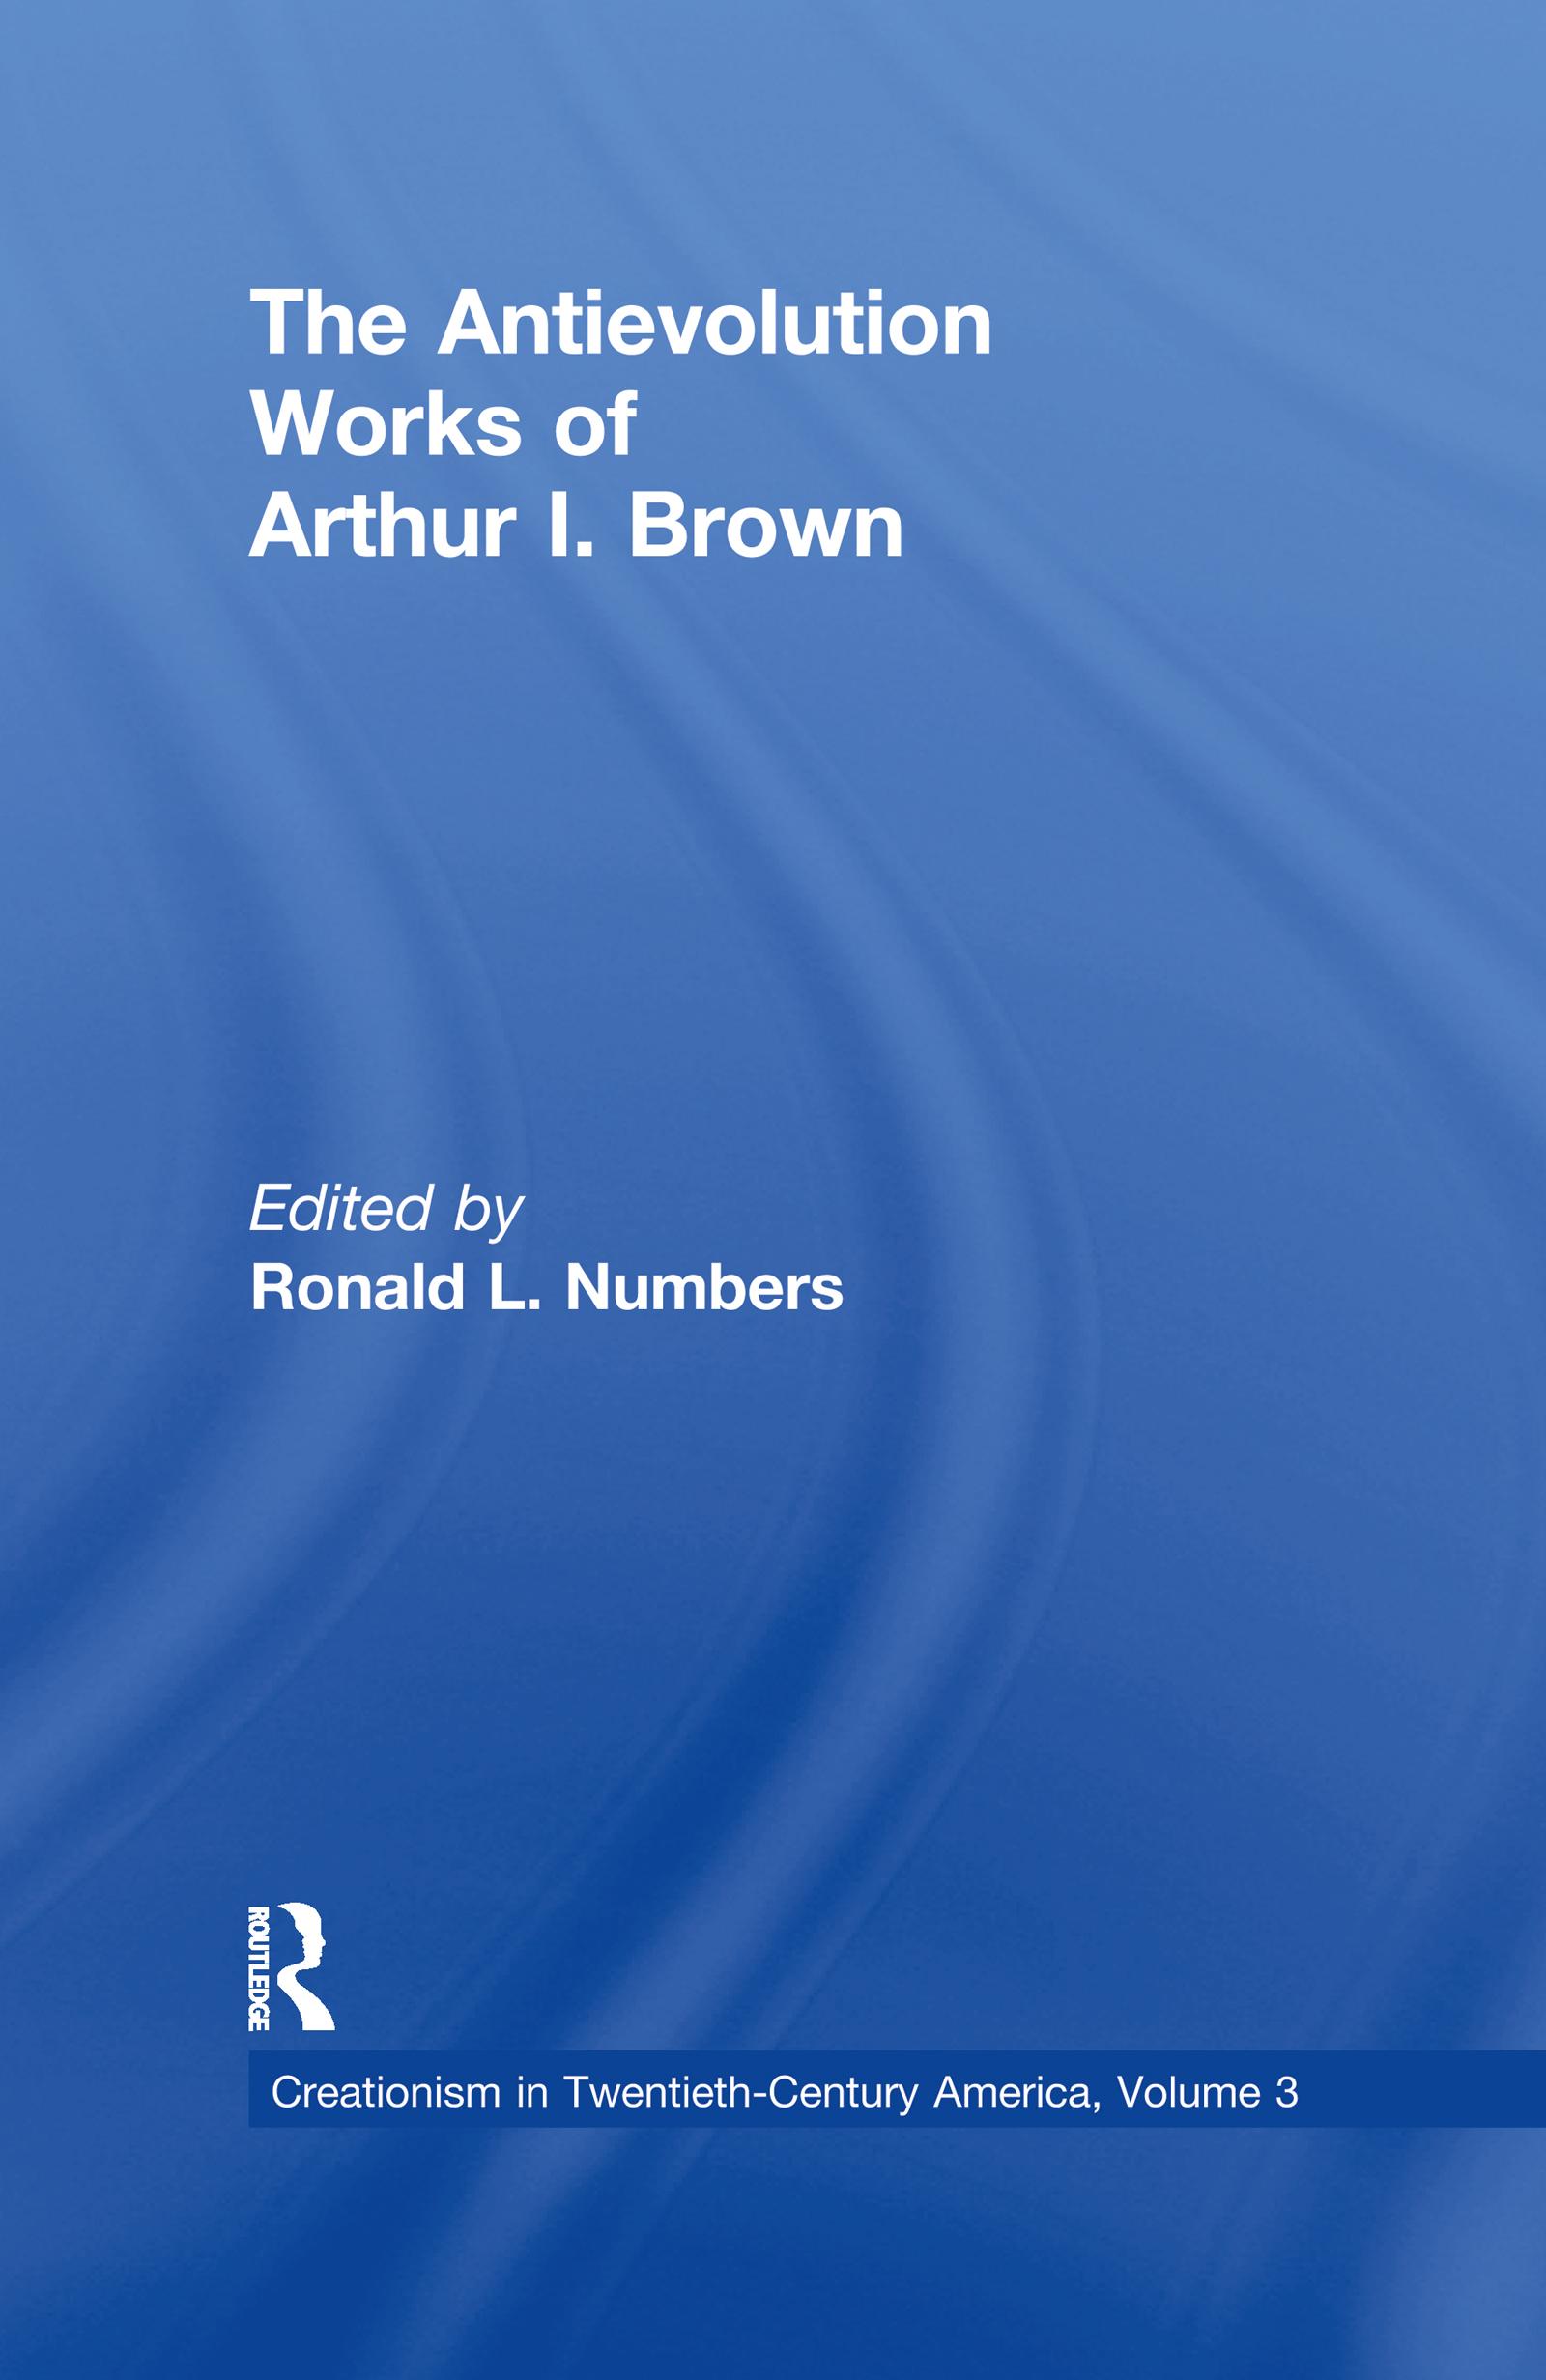 The Antievolution Works of Arthur I. Brown